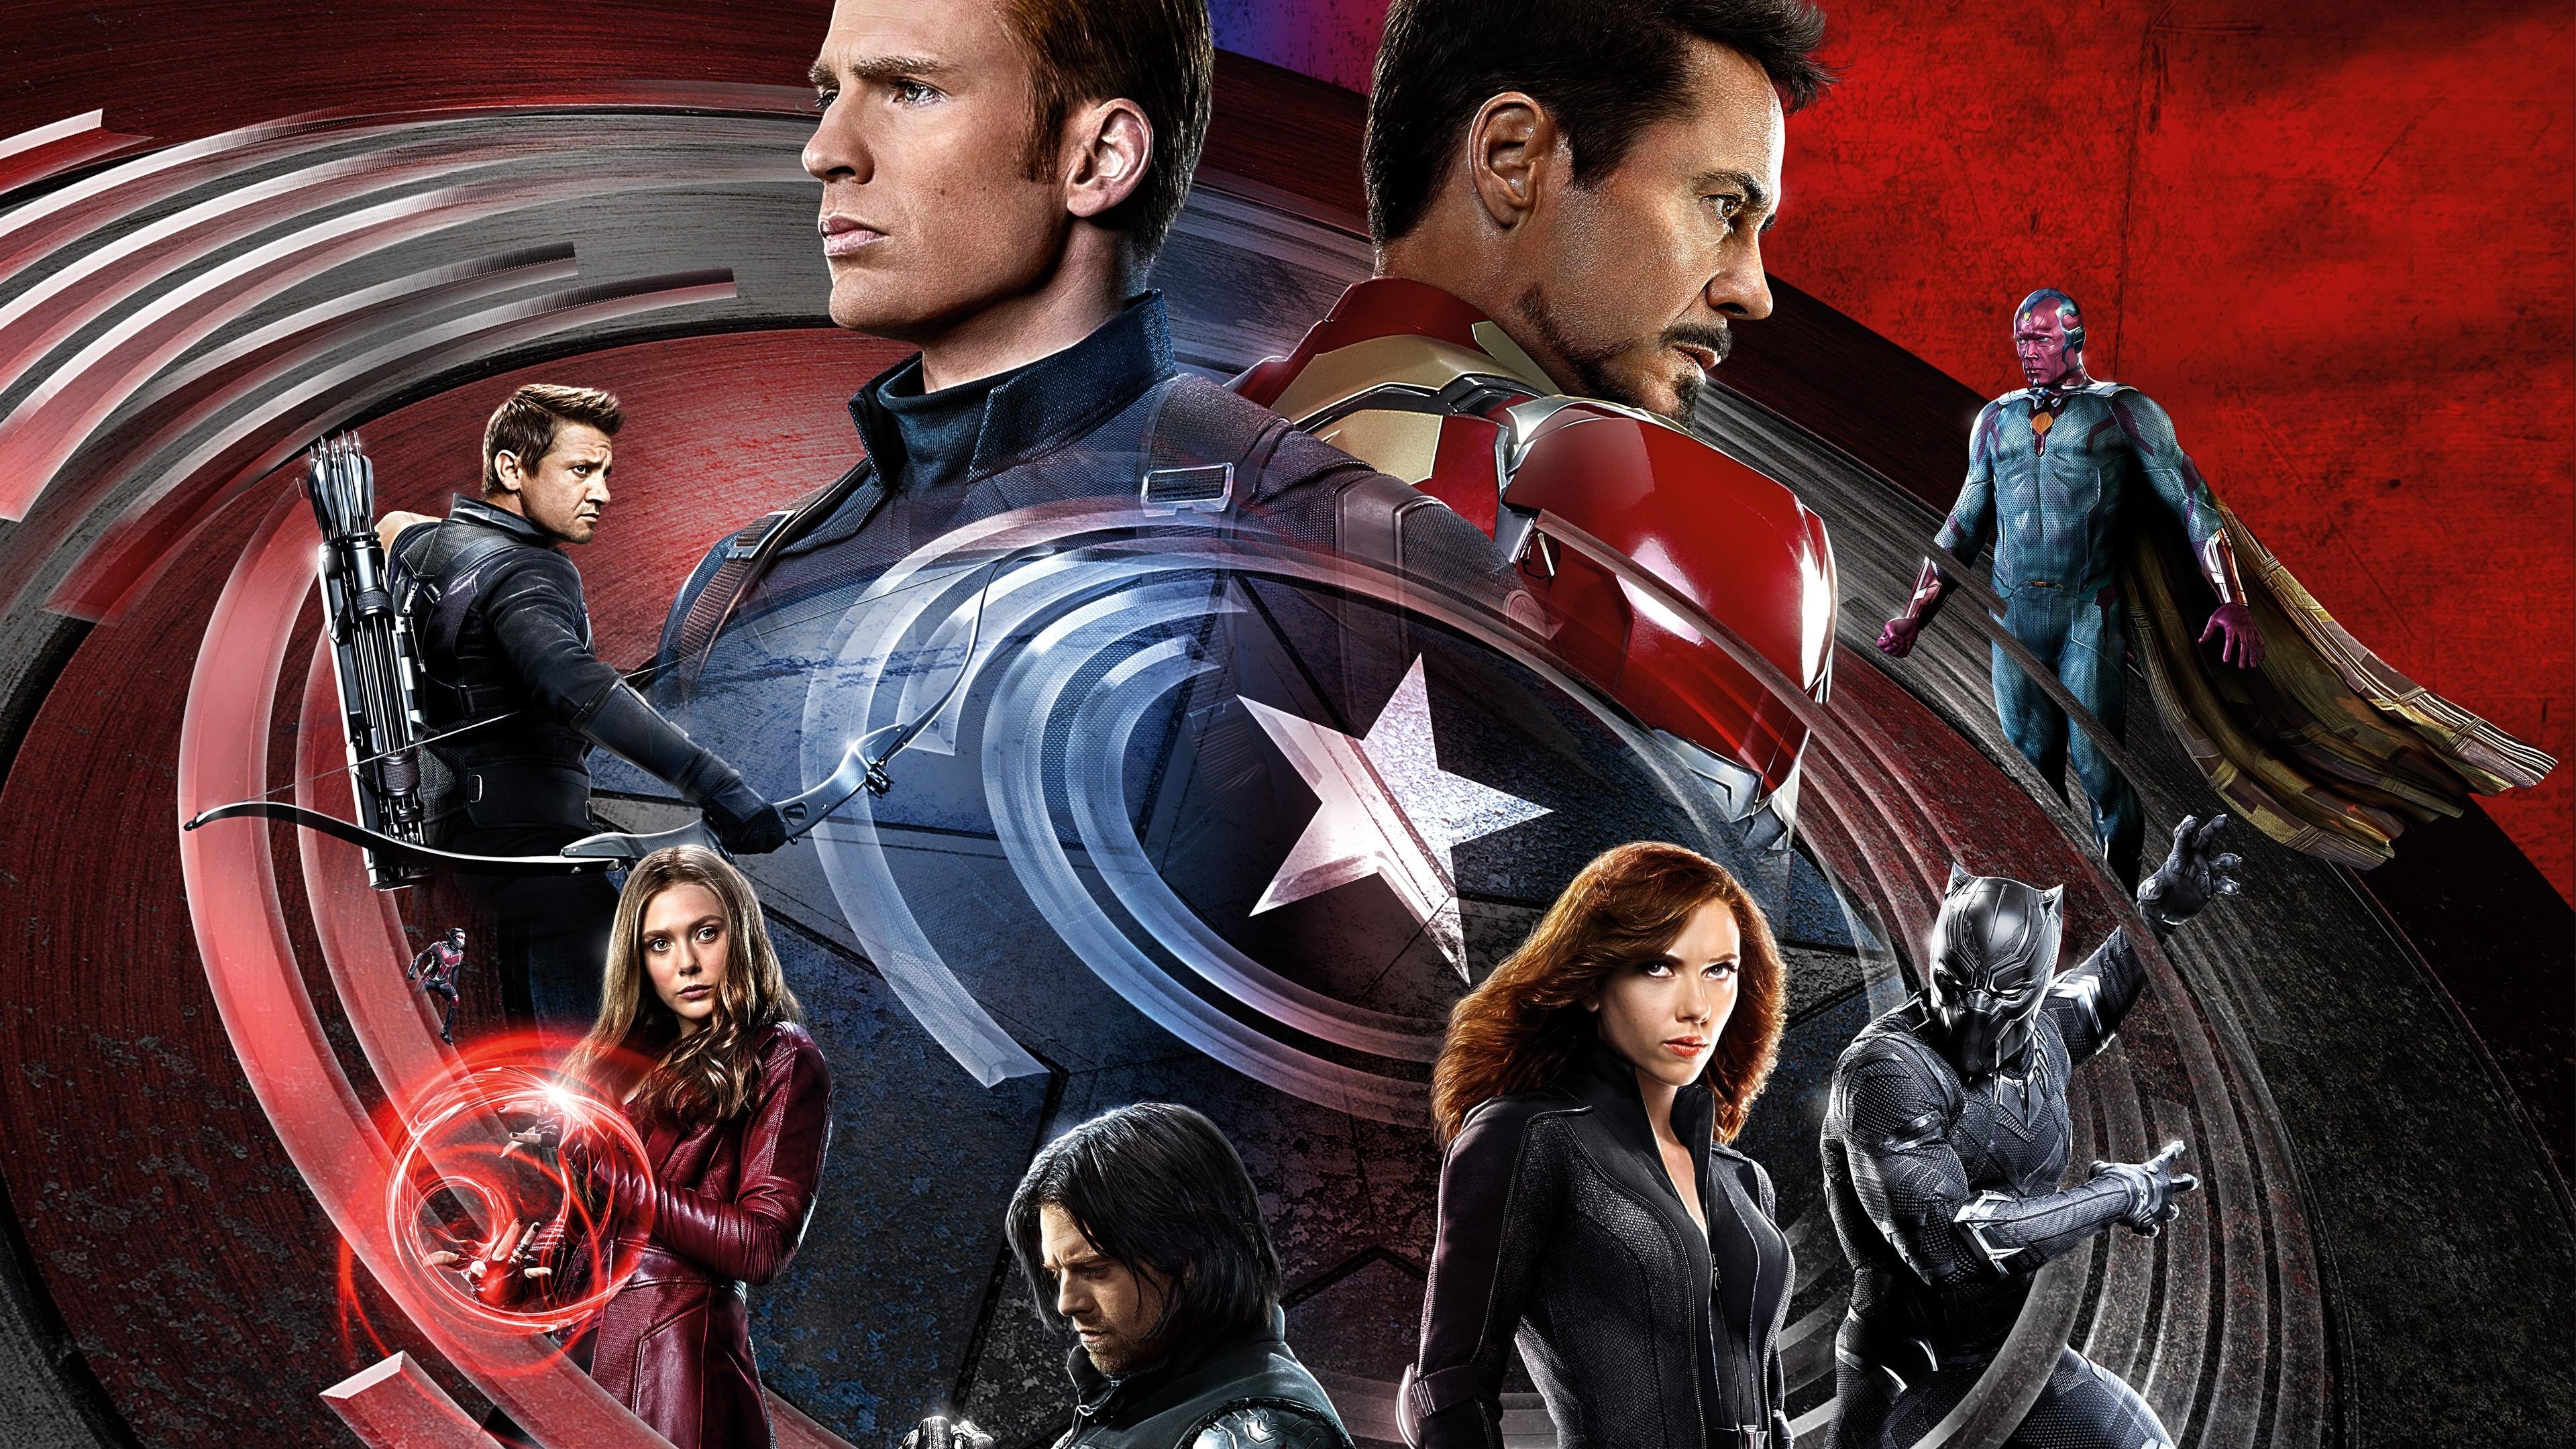 wallpaper captain america 3 civil war iron man marvel best movies of 2016 movies 10752. Black Bedroom Furniture Sets. Home Design Ideas